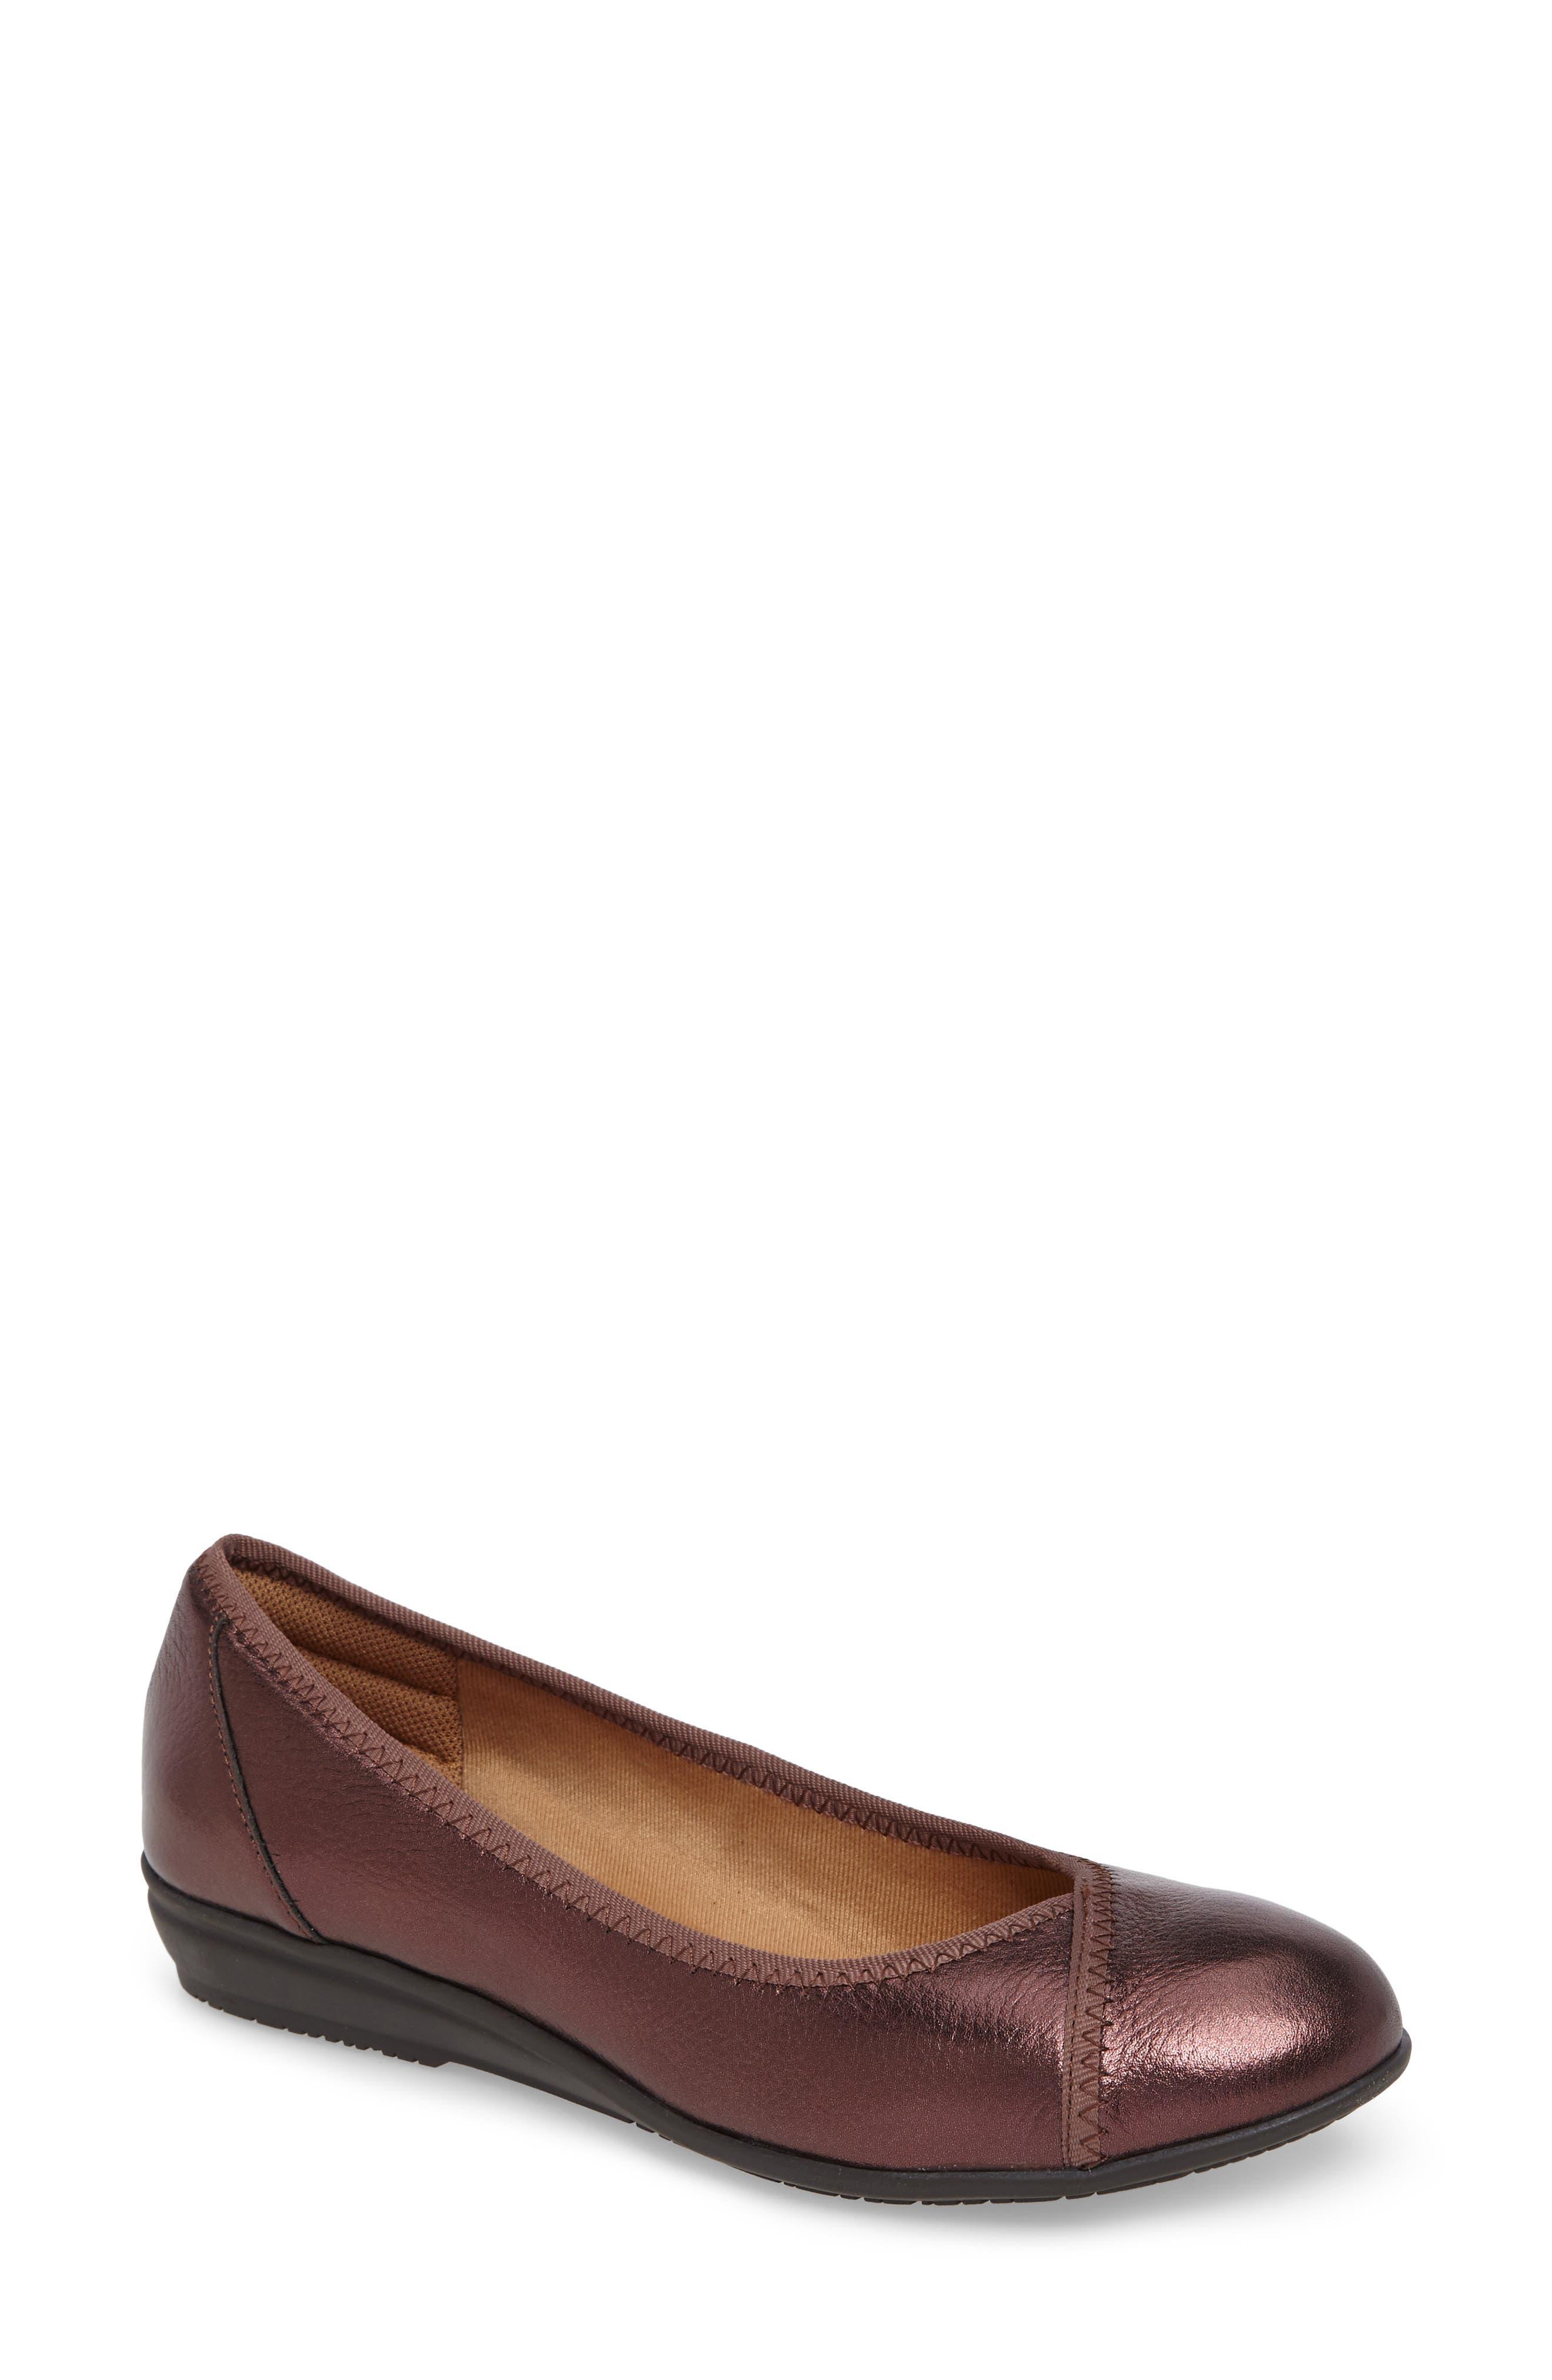 Eaton Flat,                             Main thumbnail 1, color,                             Chianti Metallic Leather